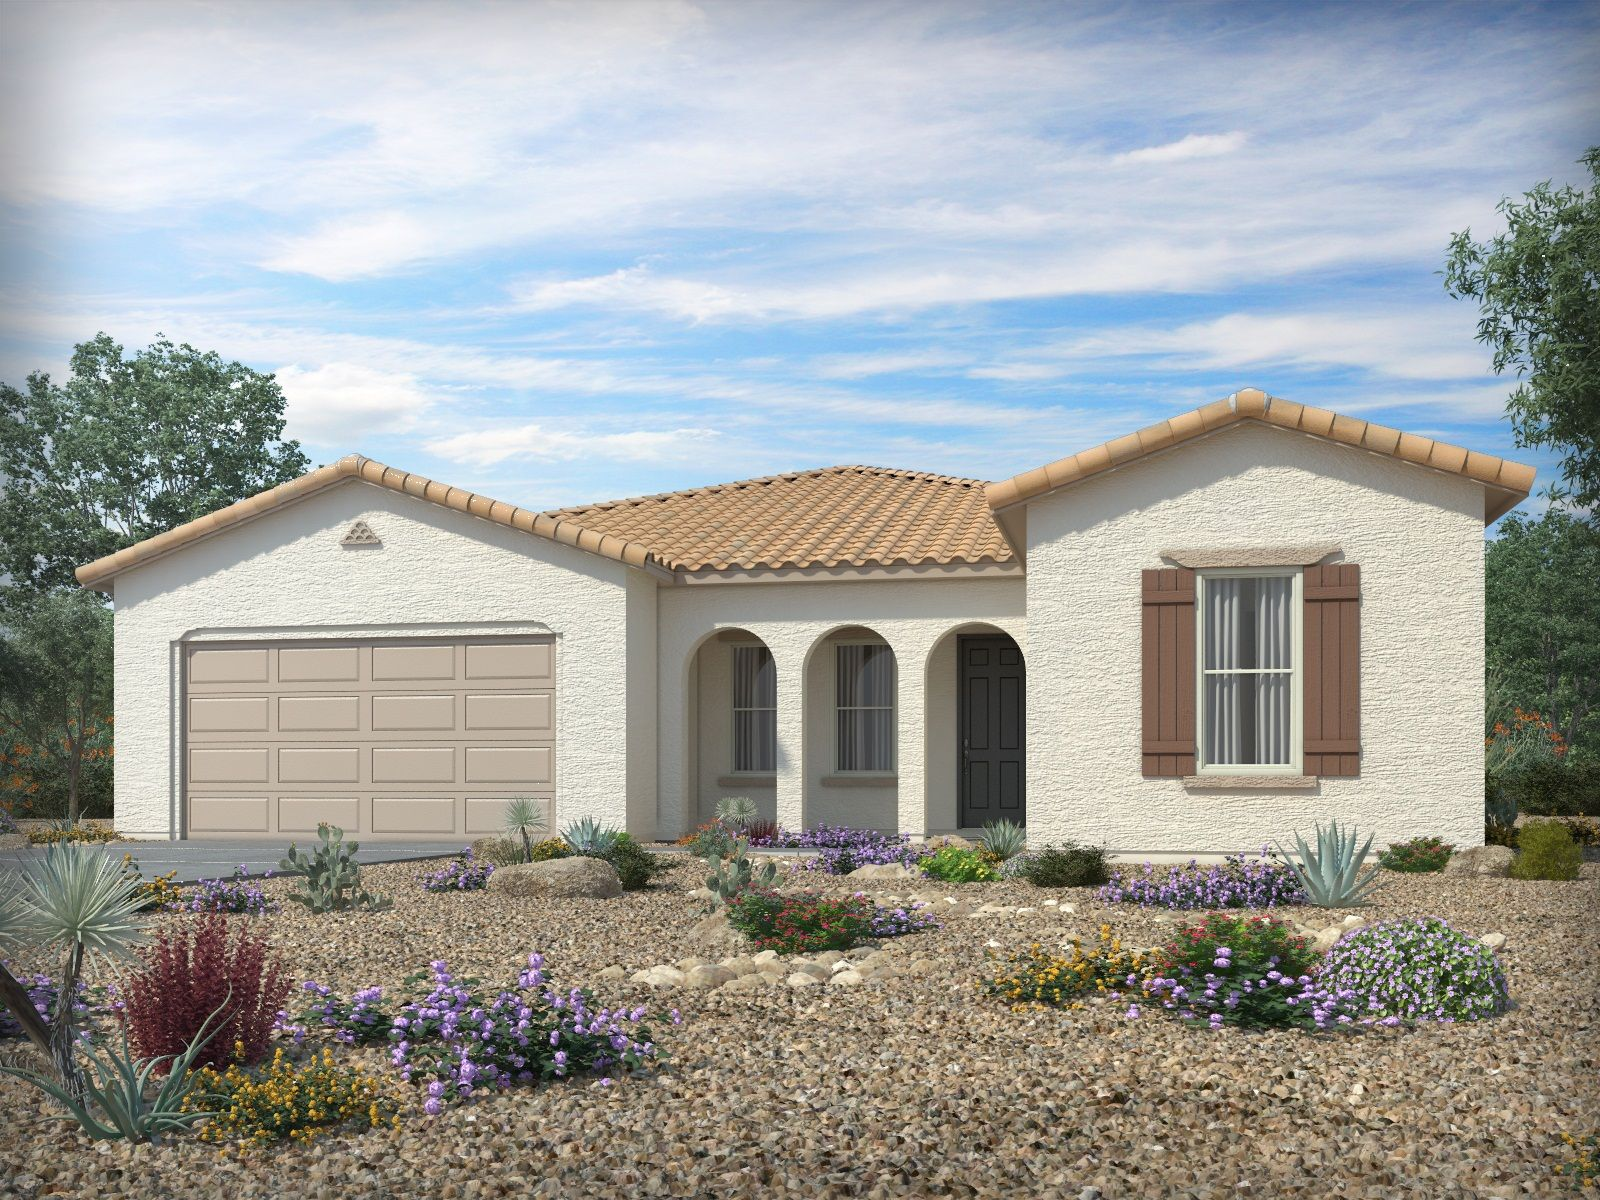 Single Family for Sale at Mission Royale - Platinum Series - Redding 2611 E. Questa Trail Casa Grande, Arizona 85194 United States